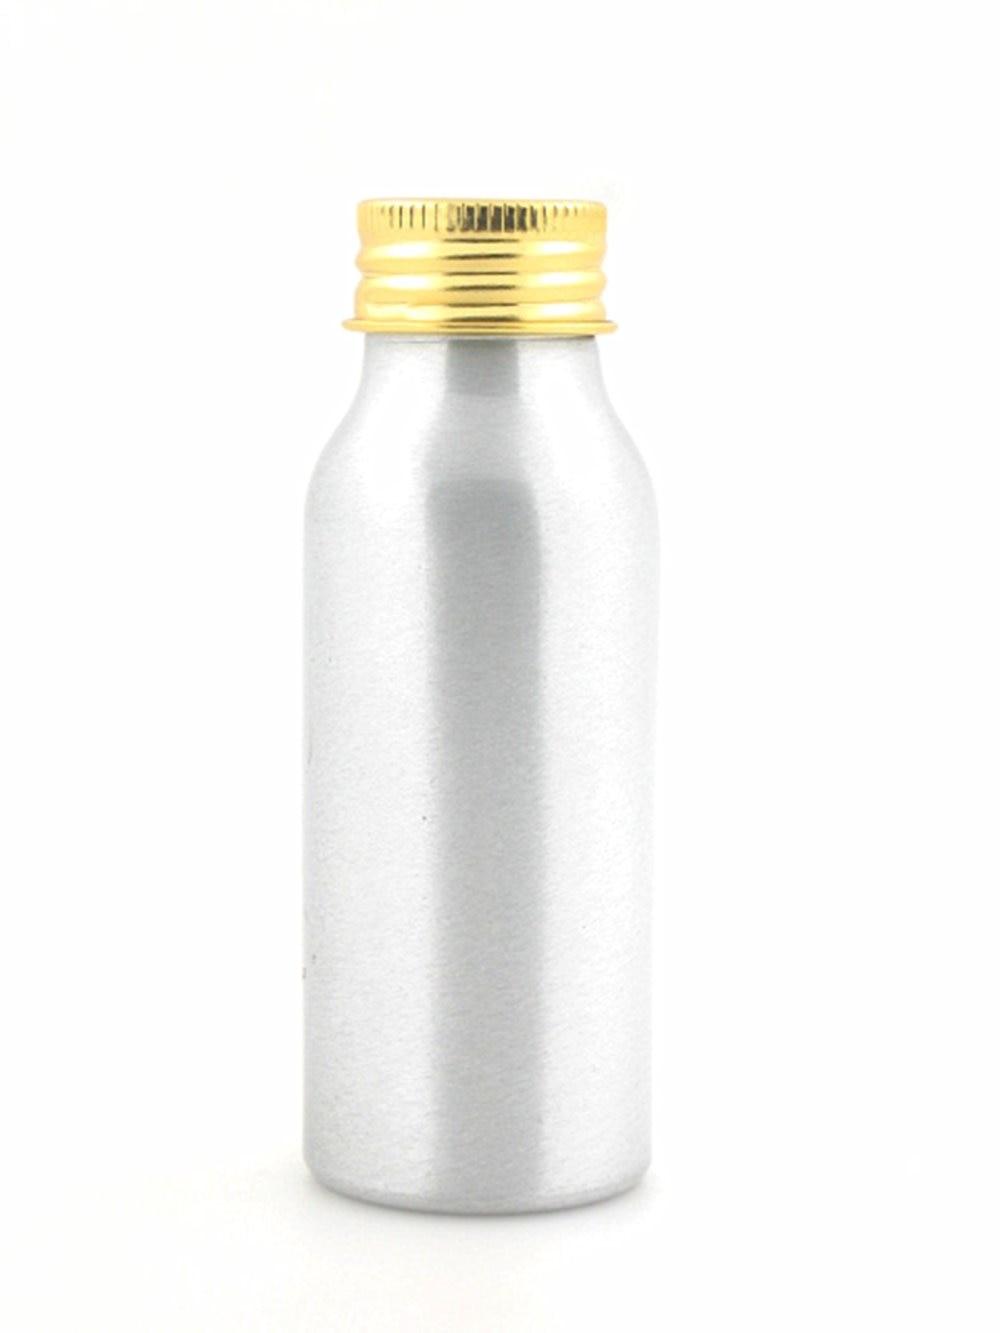 50ml Empty Aluminum Bottles, Sliver Metal Bottle With Gold/silver Lined Aluminum Lid